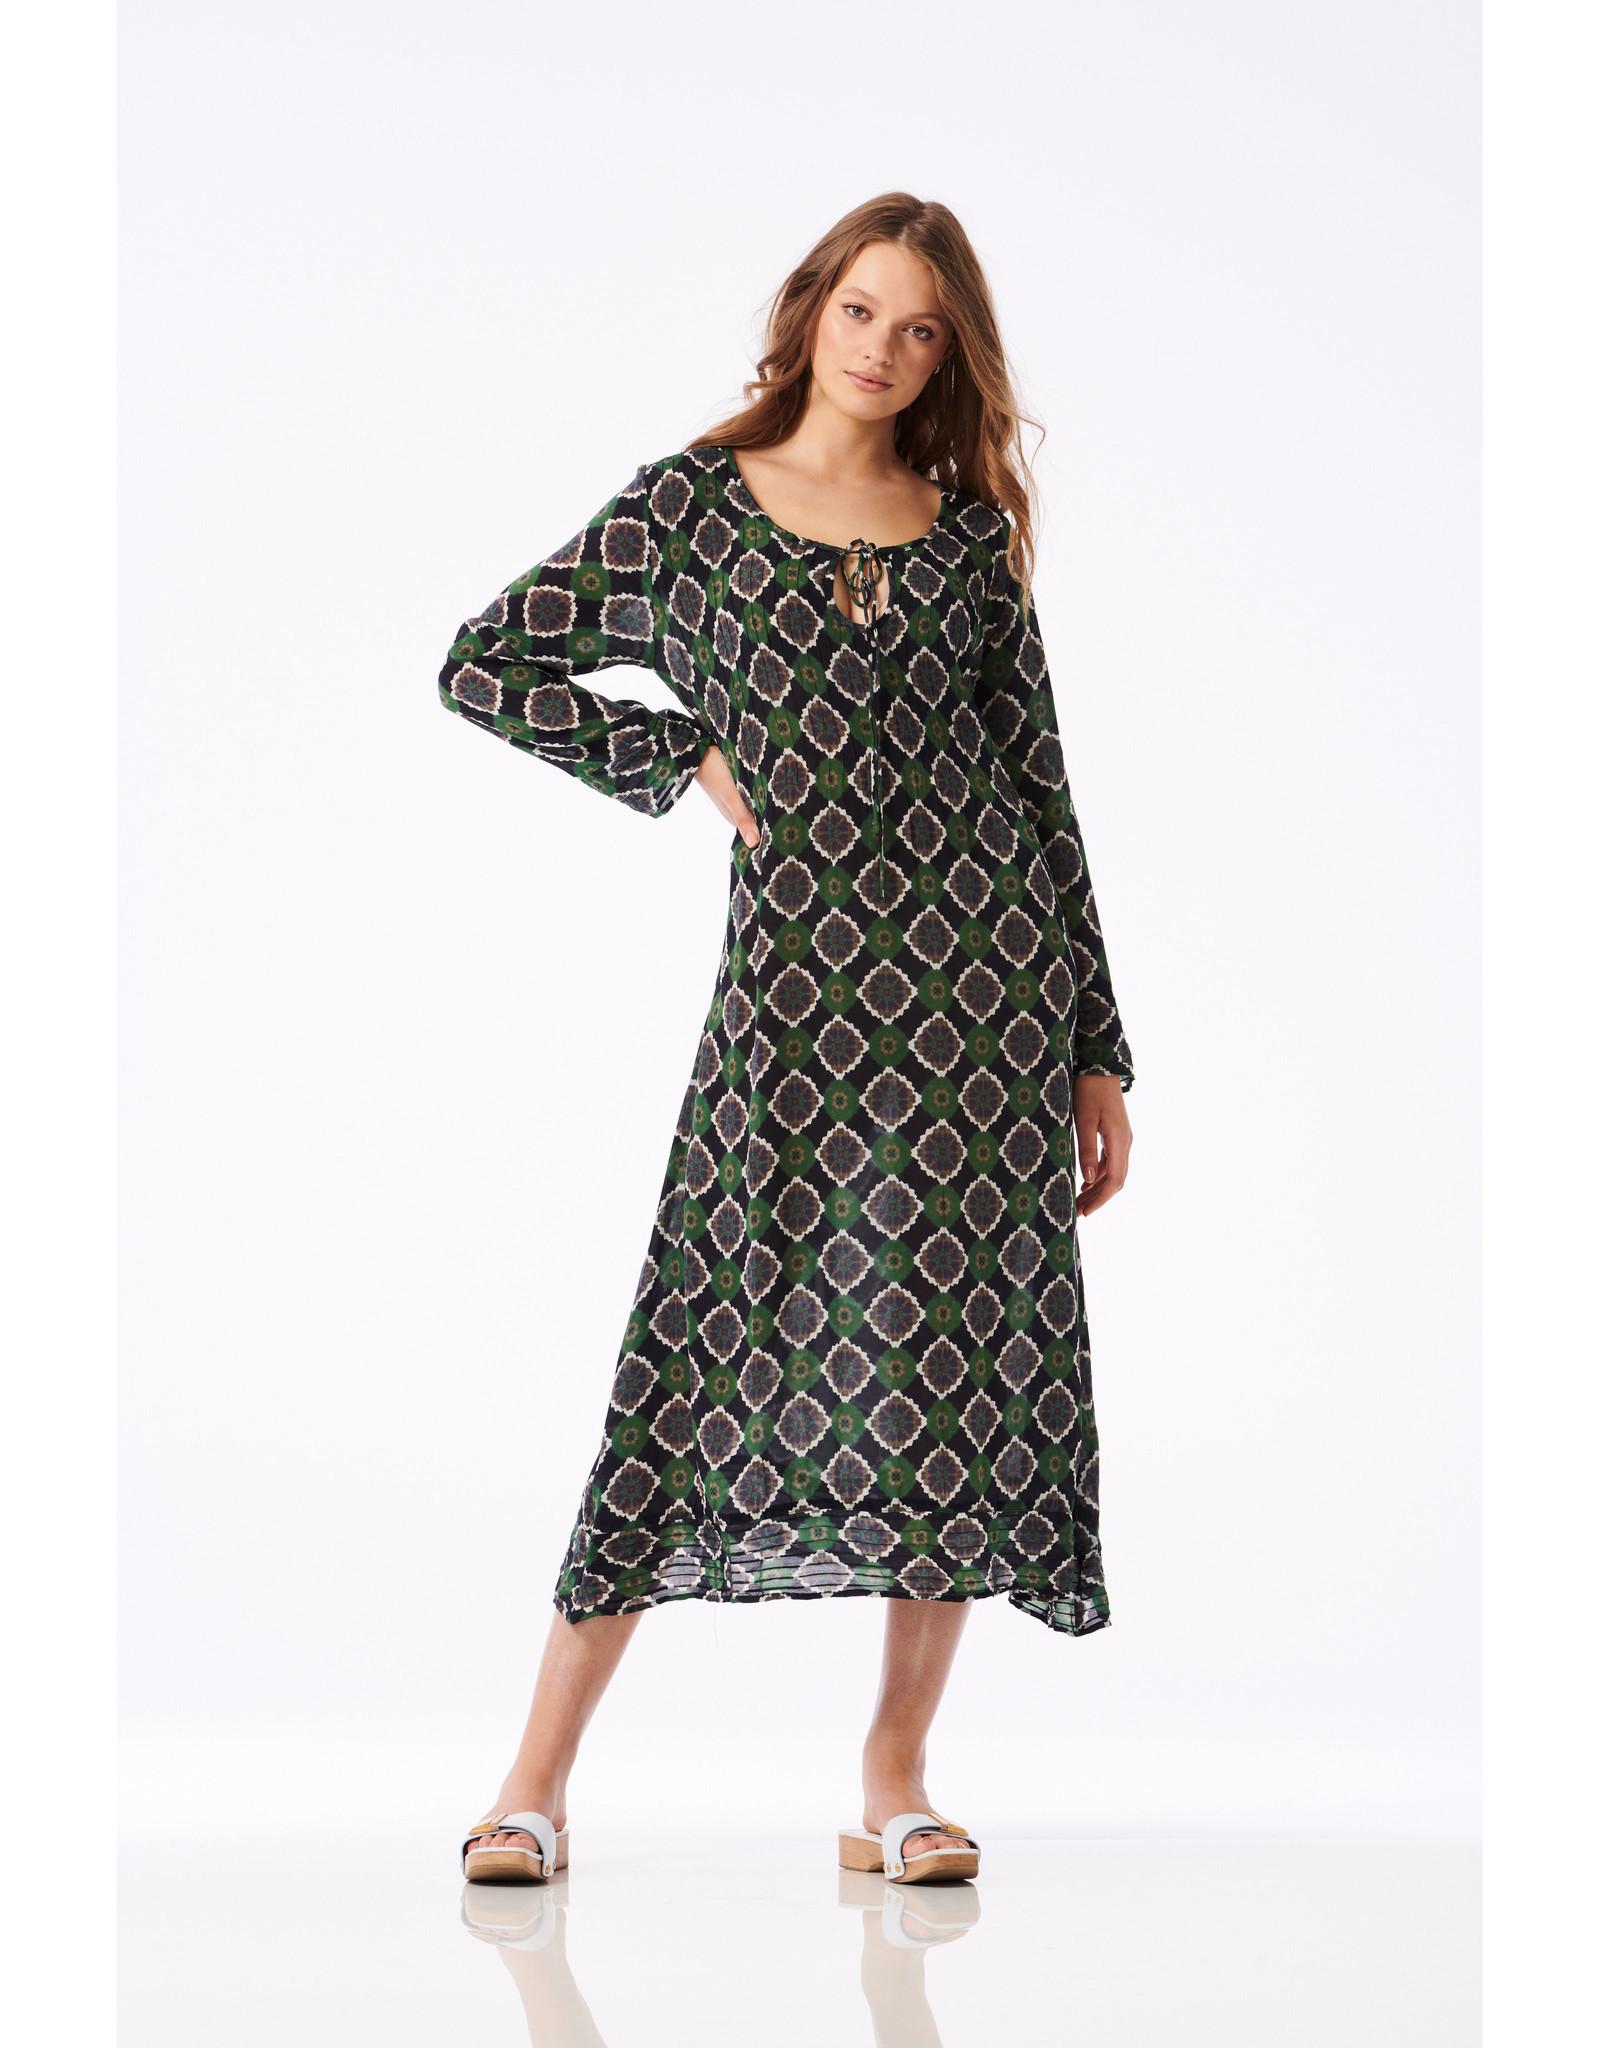 ONESEASON MARILYN DRESS PORTUGAL